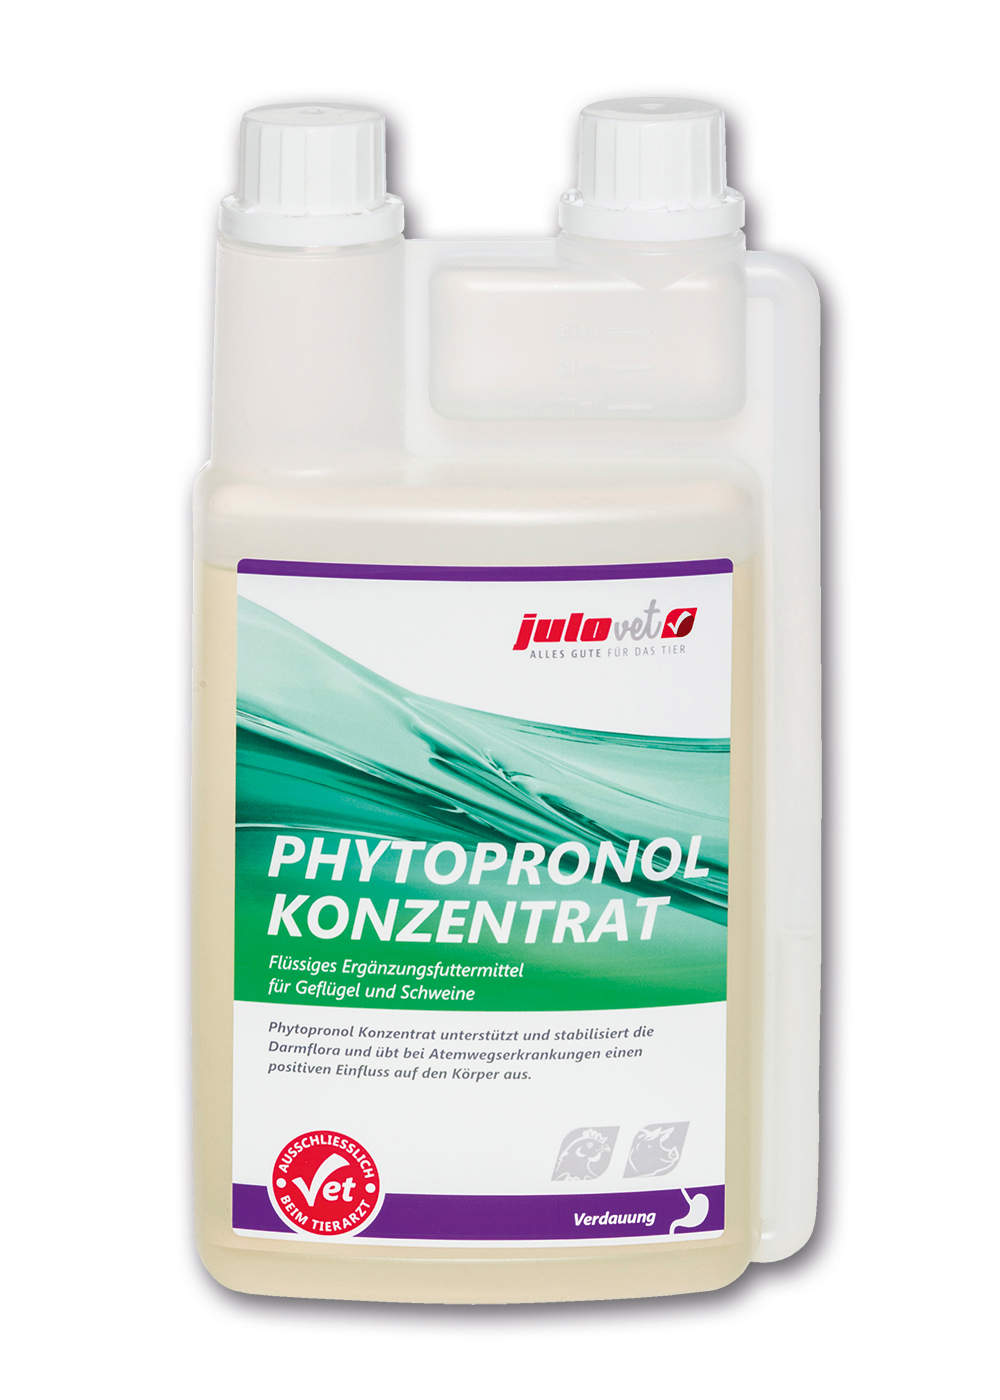 Phytopronol Konzentrat